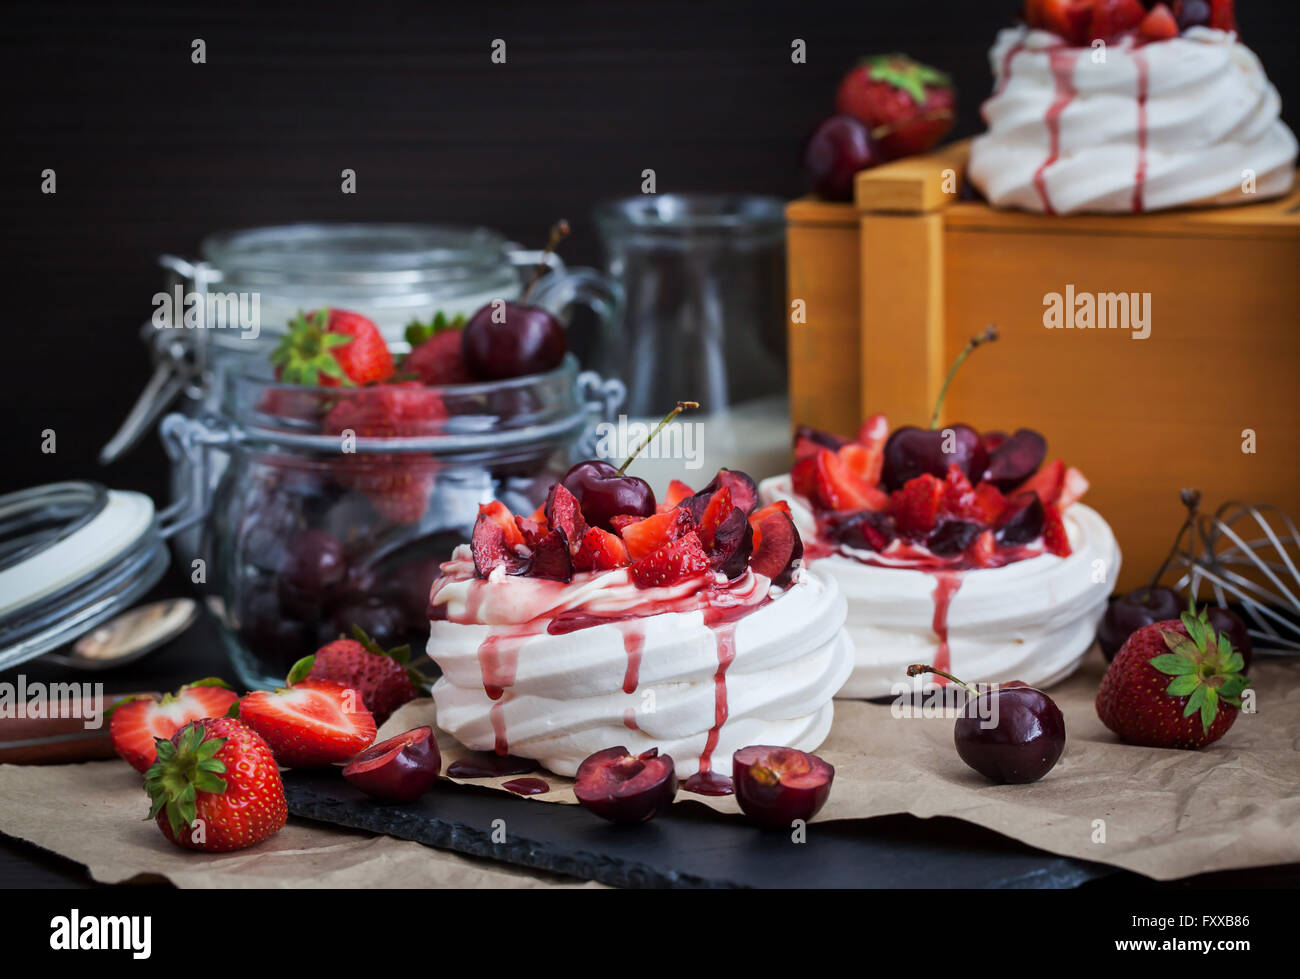 Portion of mini Pavlova meringue cake decorated with fresh strawberry and cherry - Stock Image